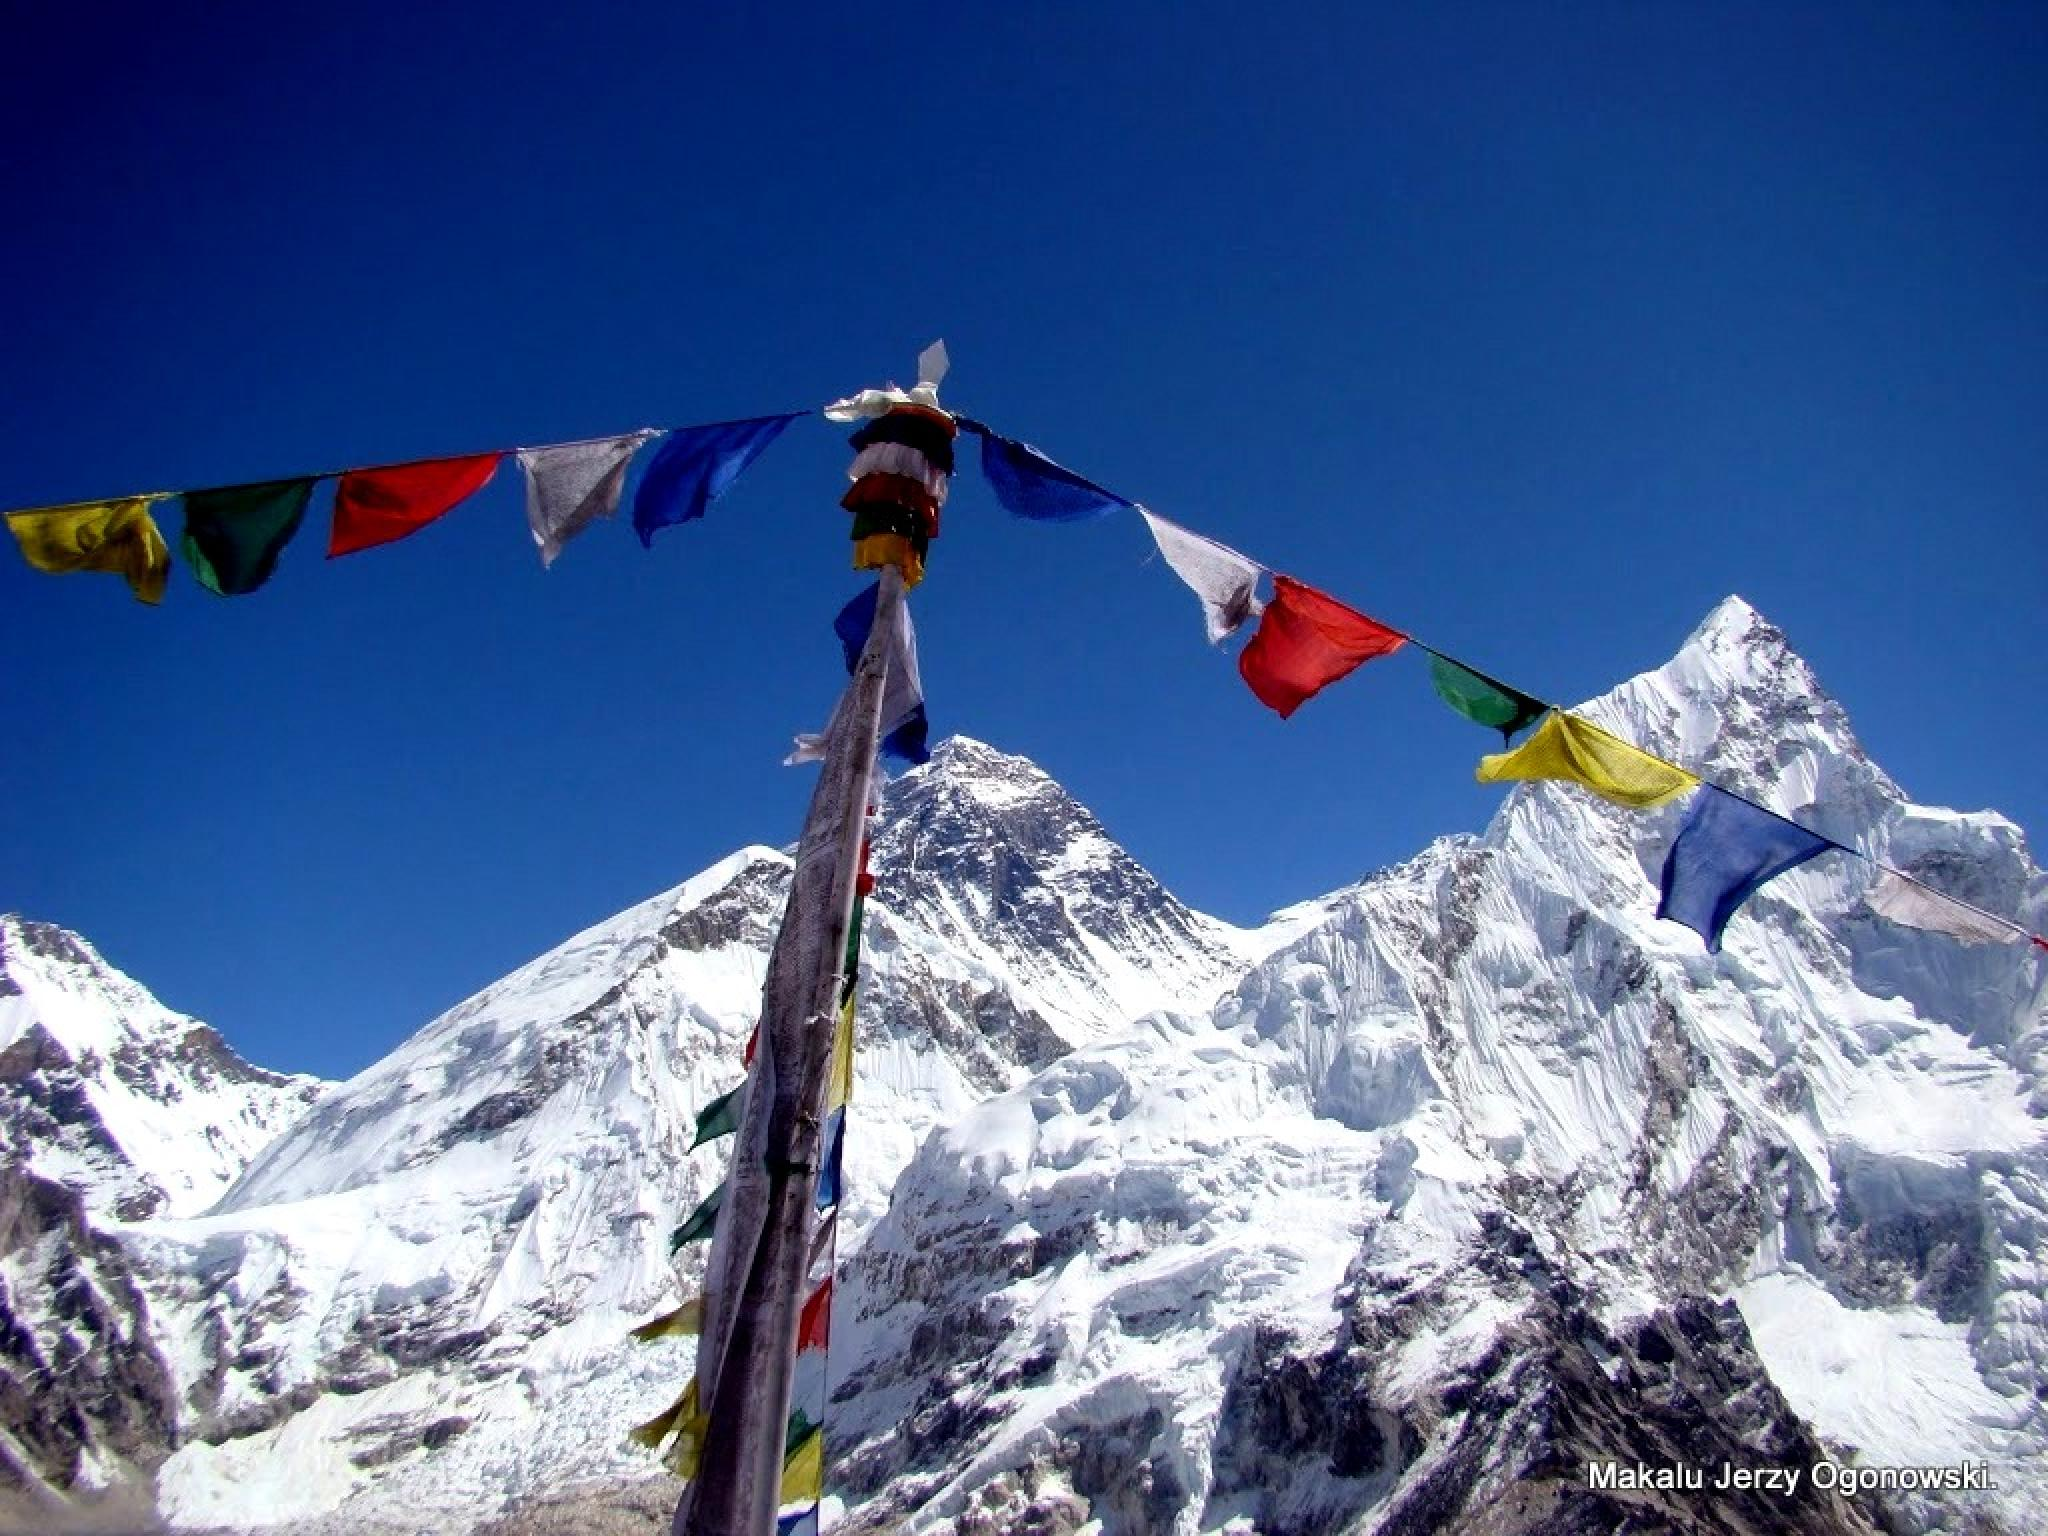 View of Mount Everest 8850m from Kala Patar.Himalayas Nepal by Makalu Jerzy Ogonowski